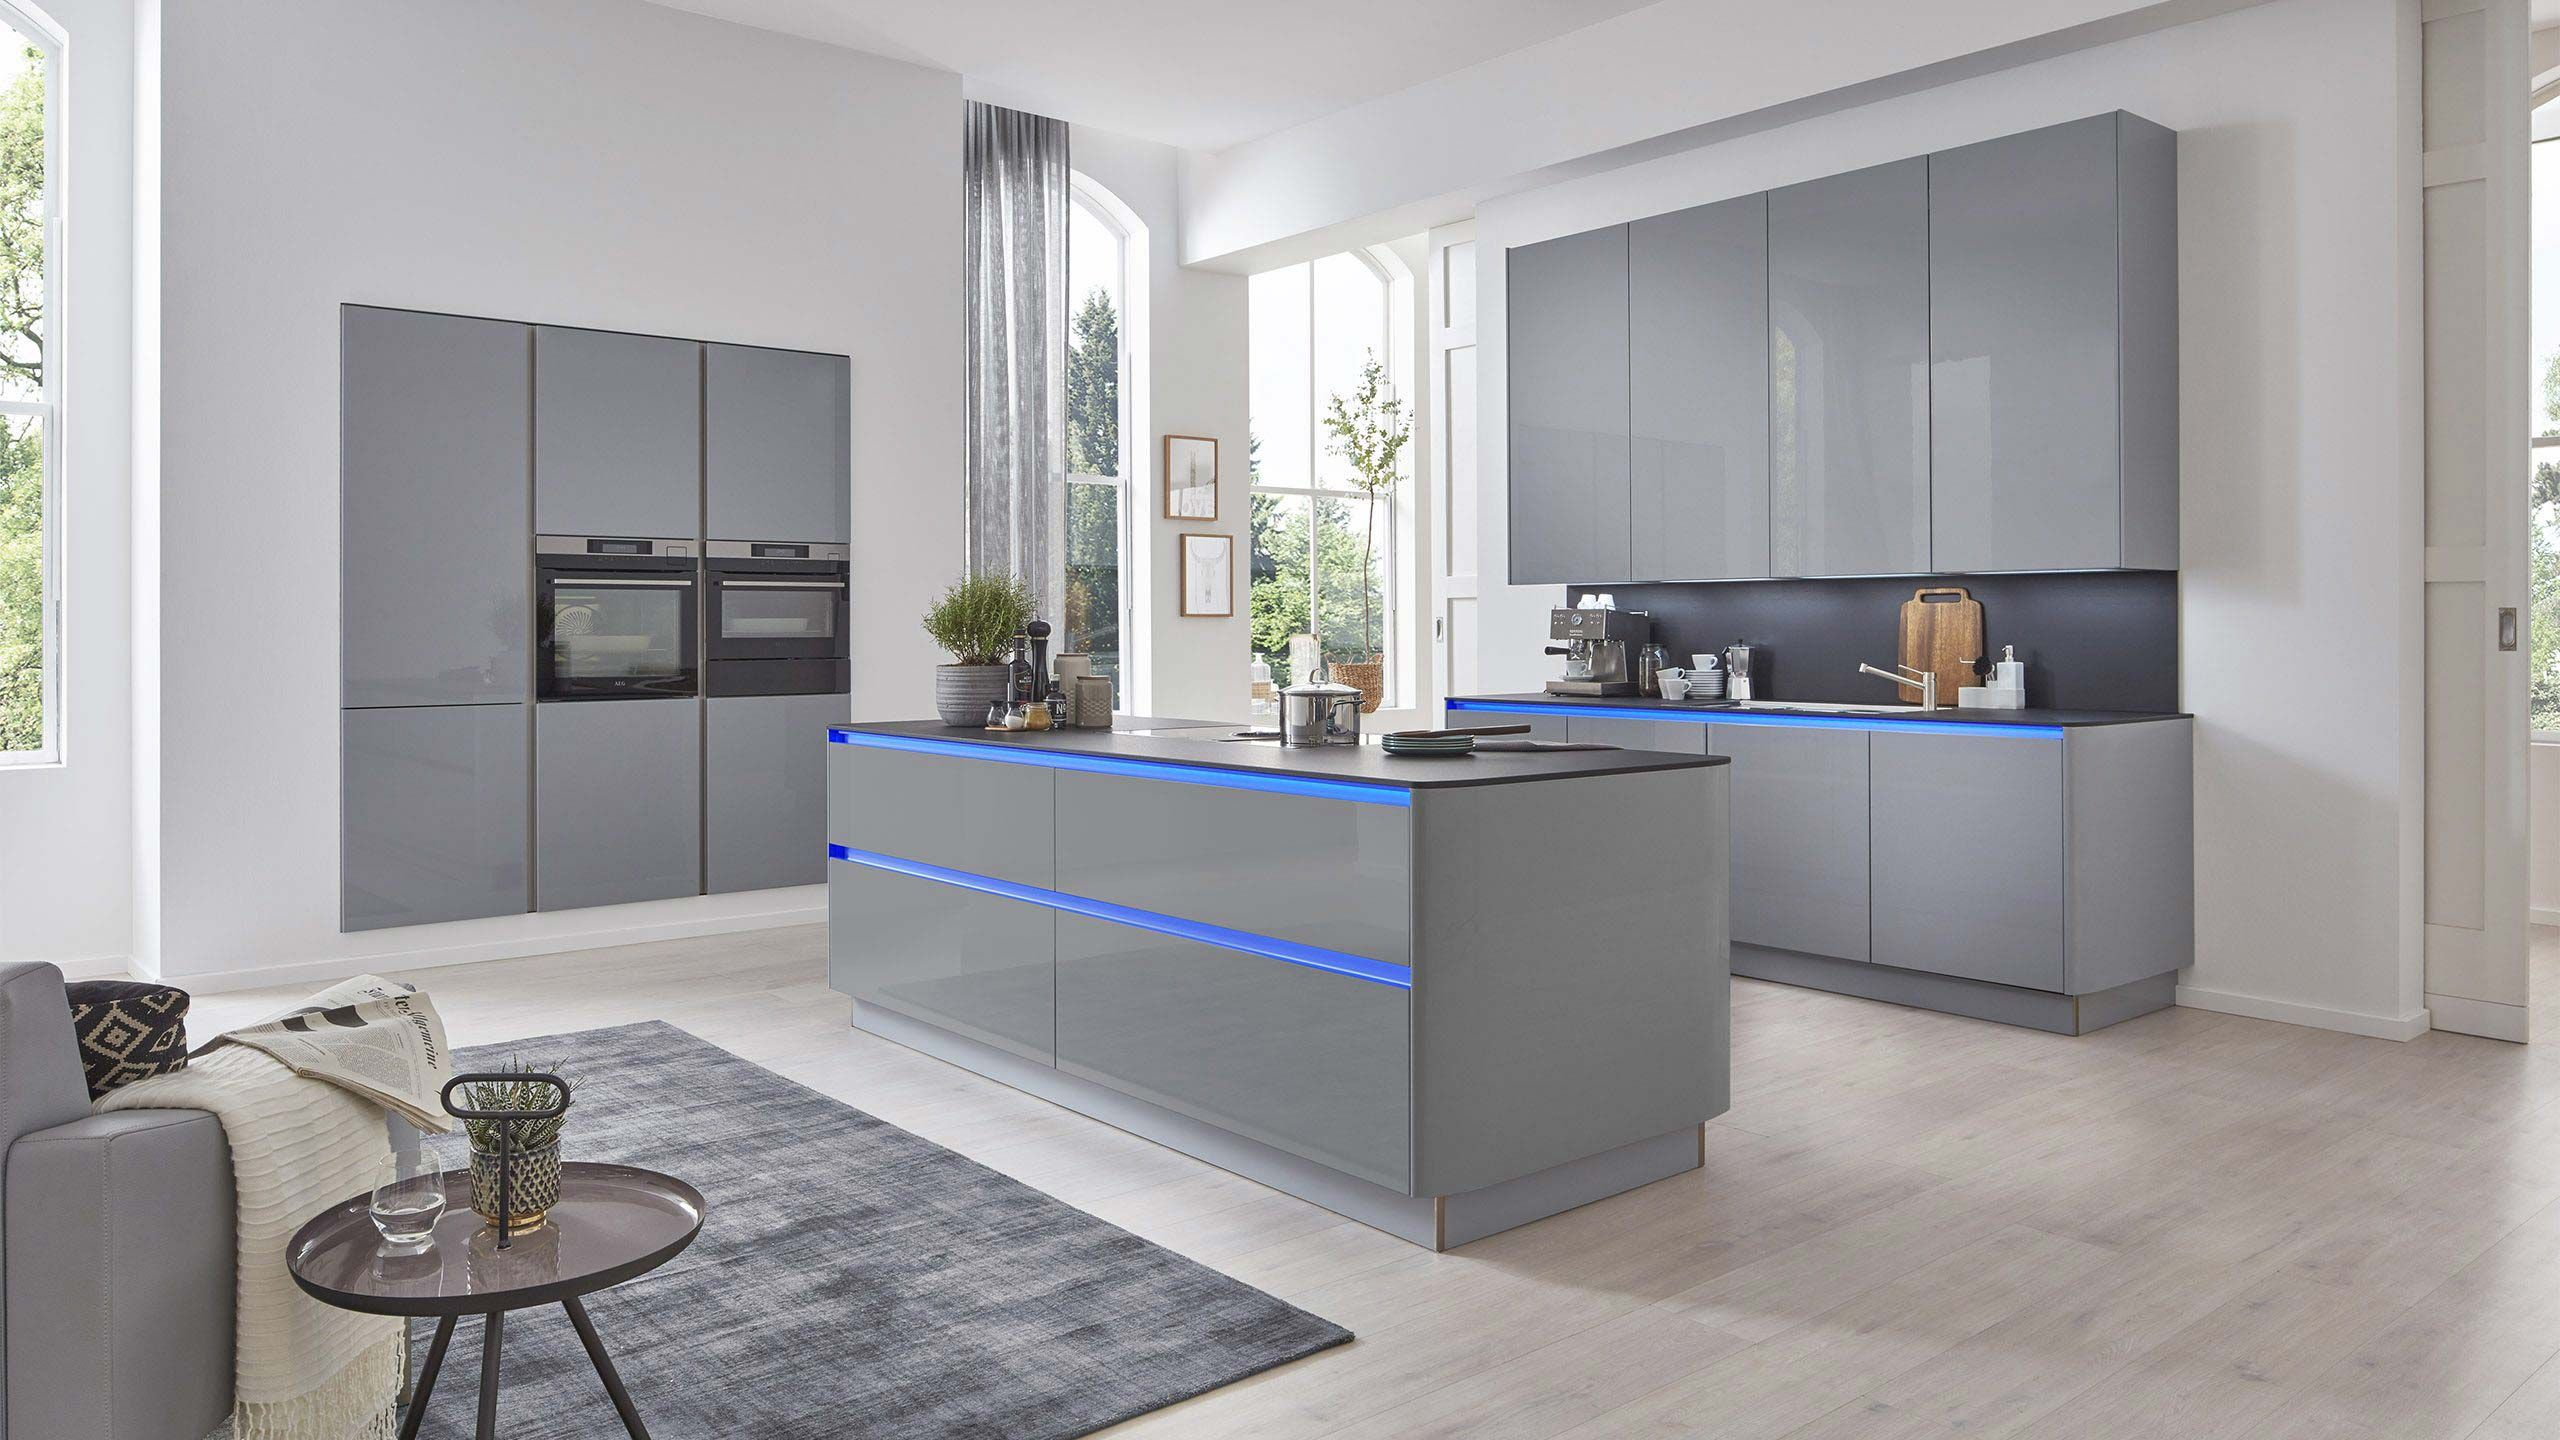 Kuchen Arbeitsplatte Java Schiefer Kitchen Worktop Java Slate In 2020 Kitchen Worktop Open Plan Kitchen Mini Kitchen